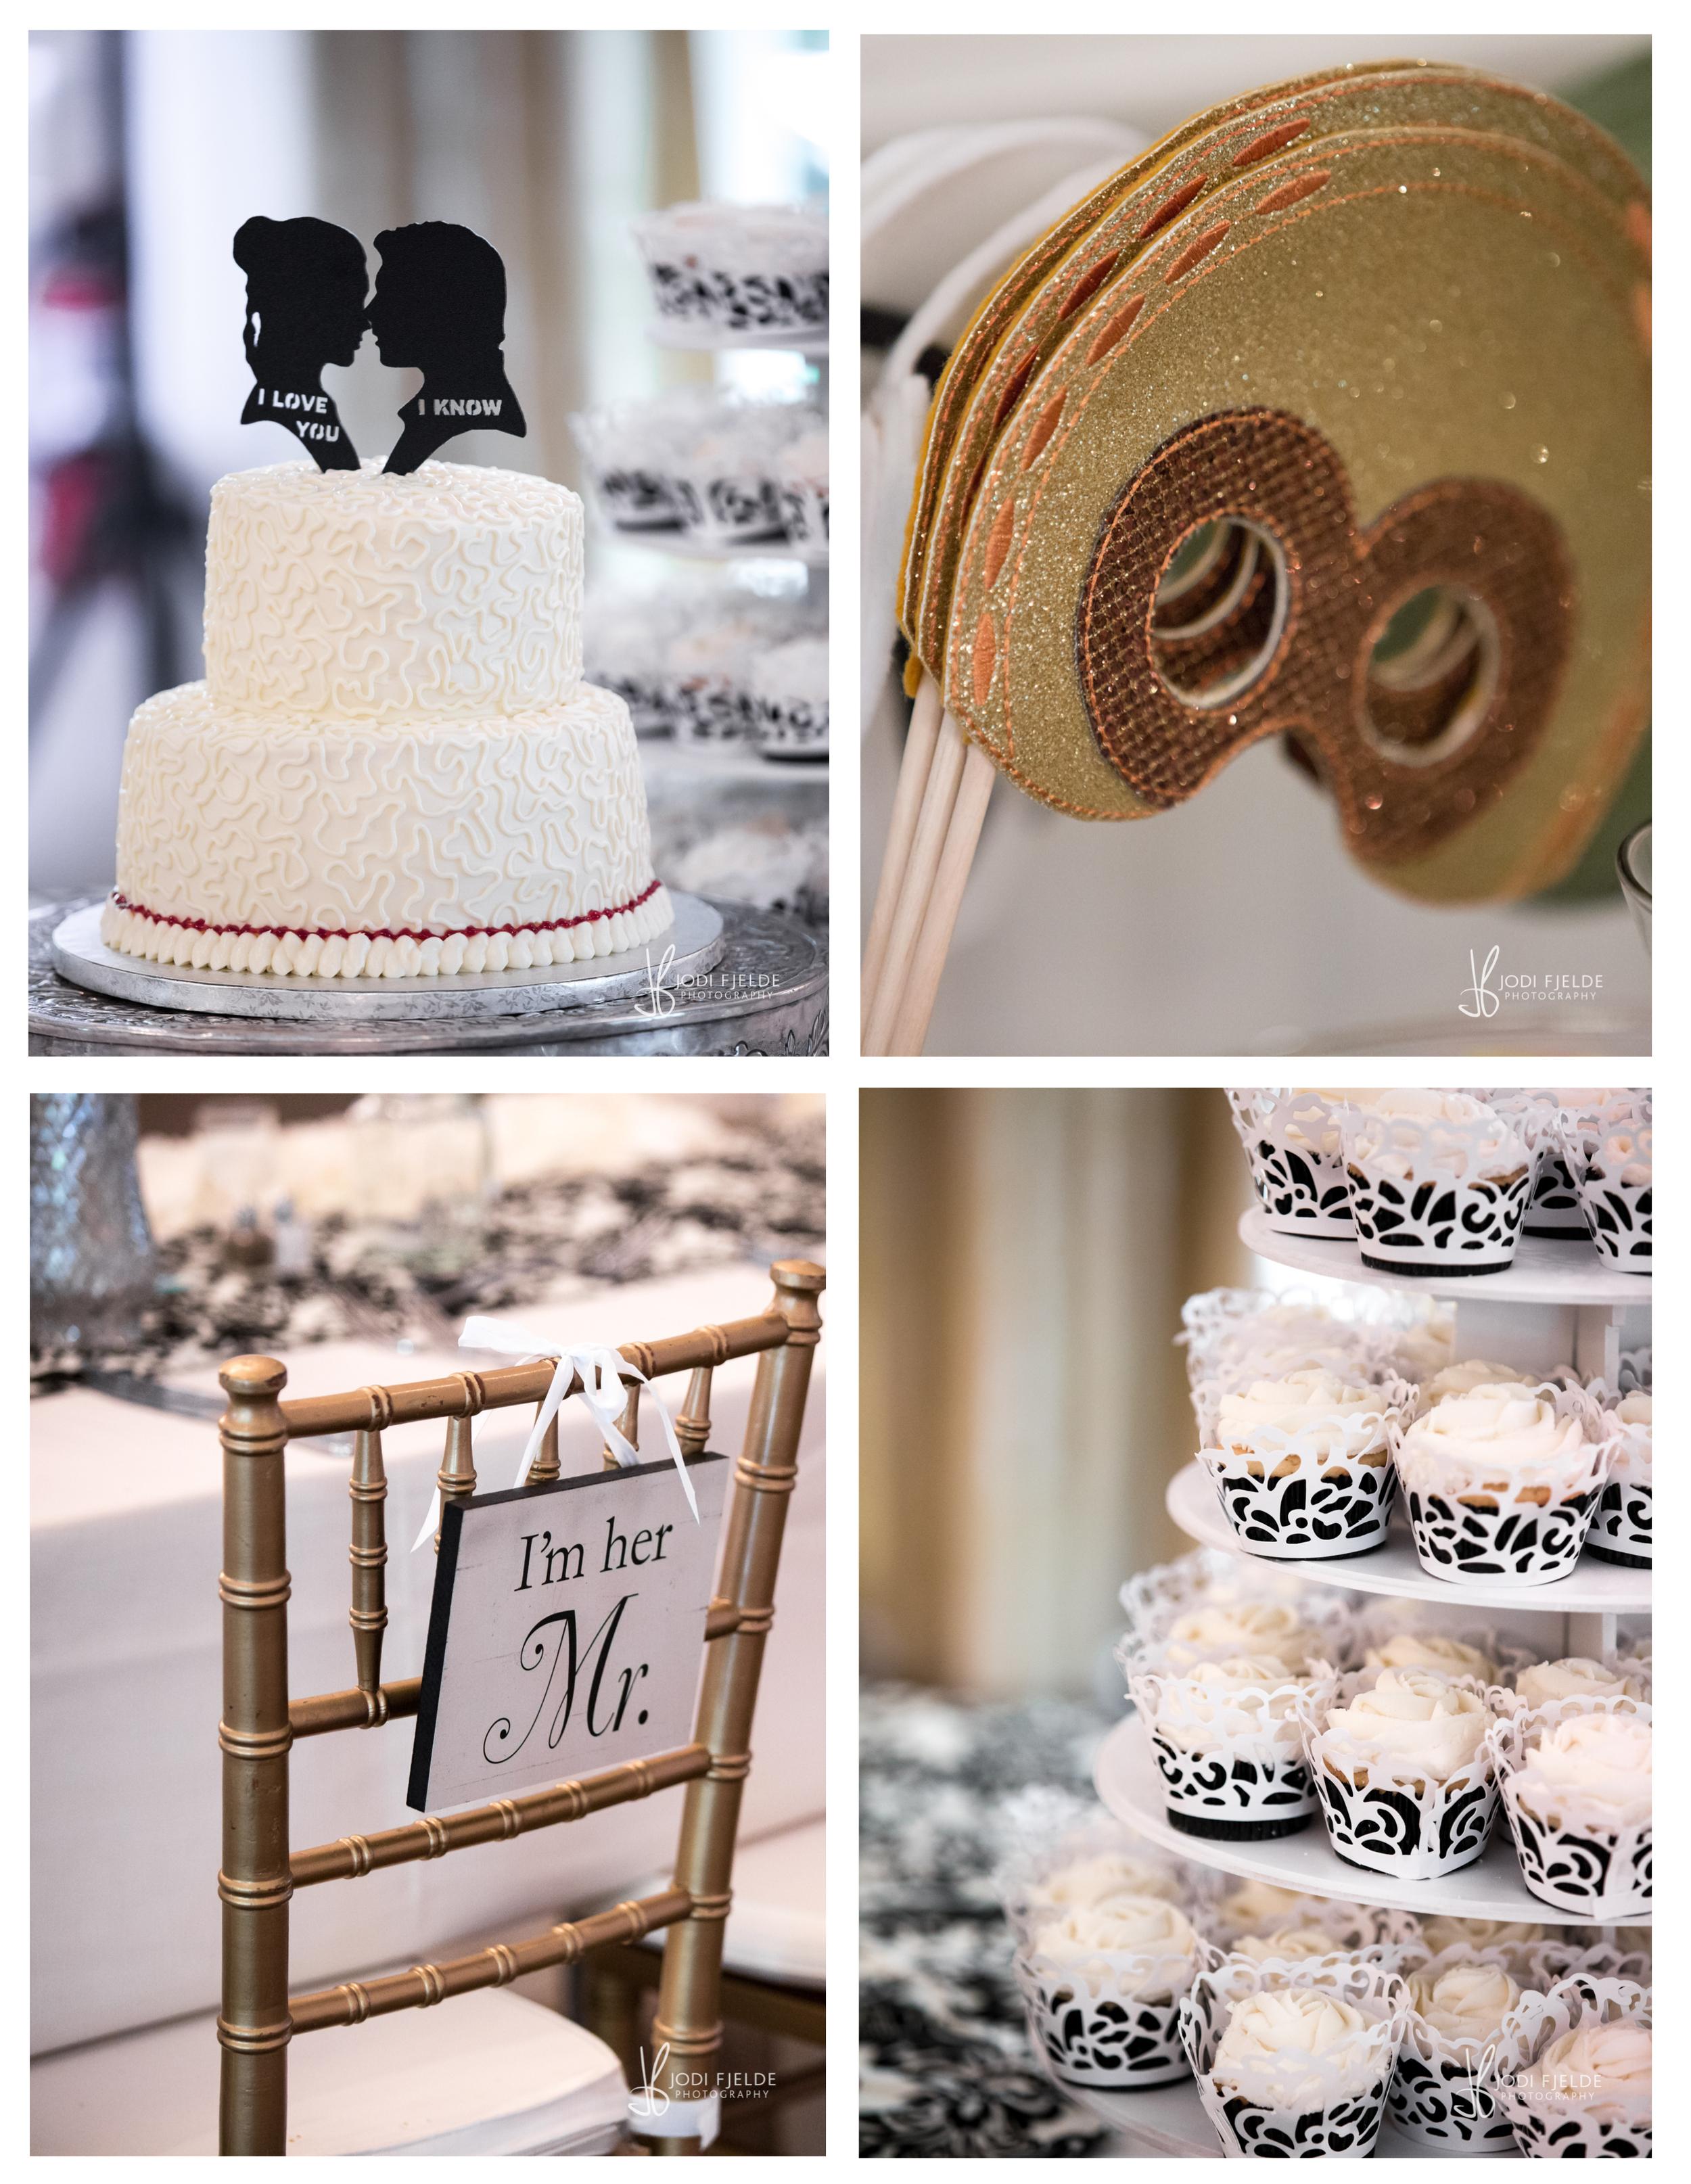 Highland_Manor_Apopka_Florida_wedding_Jackie_&_Tim_photography_jodi_Fjelde_photography-26.jpg